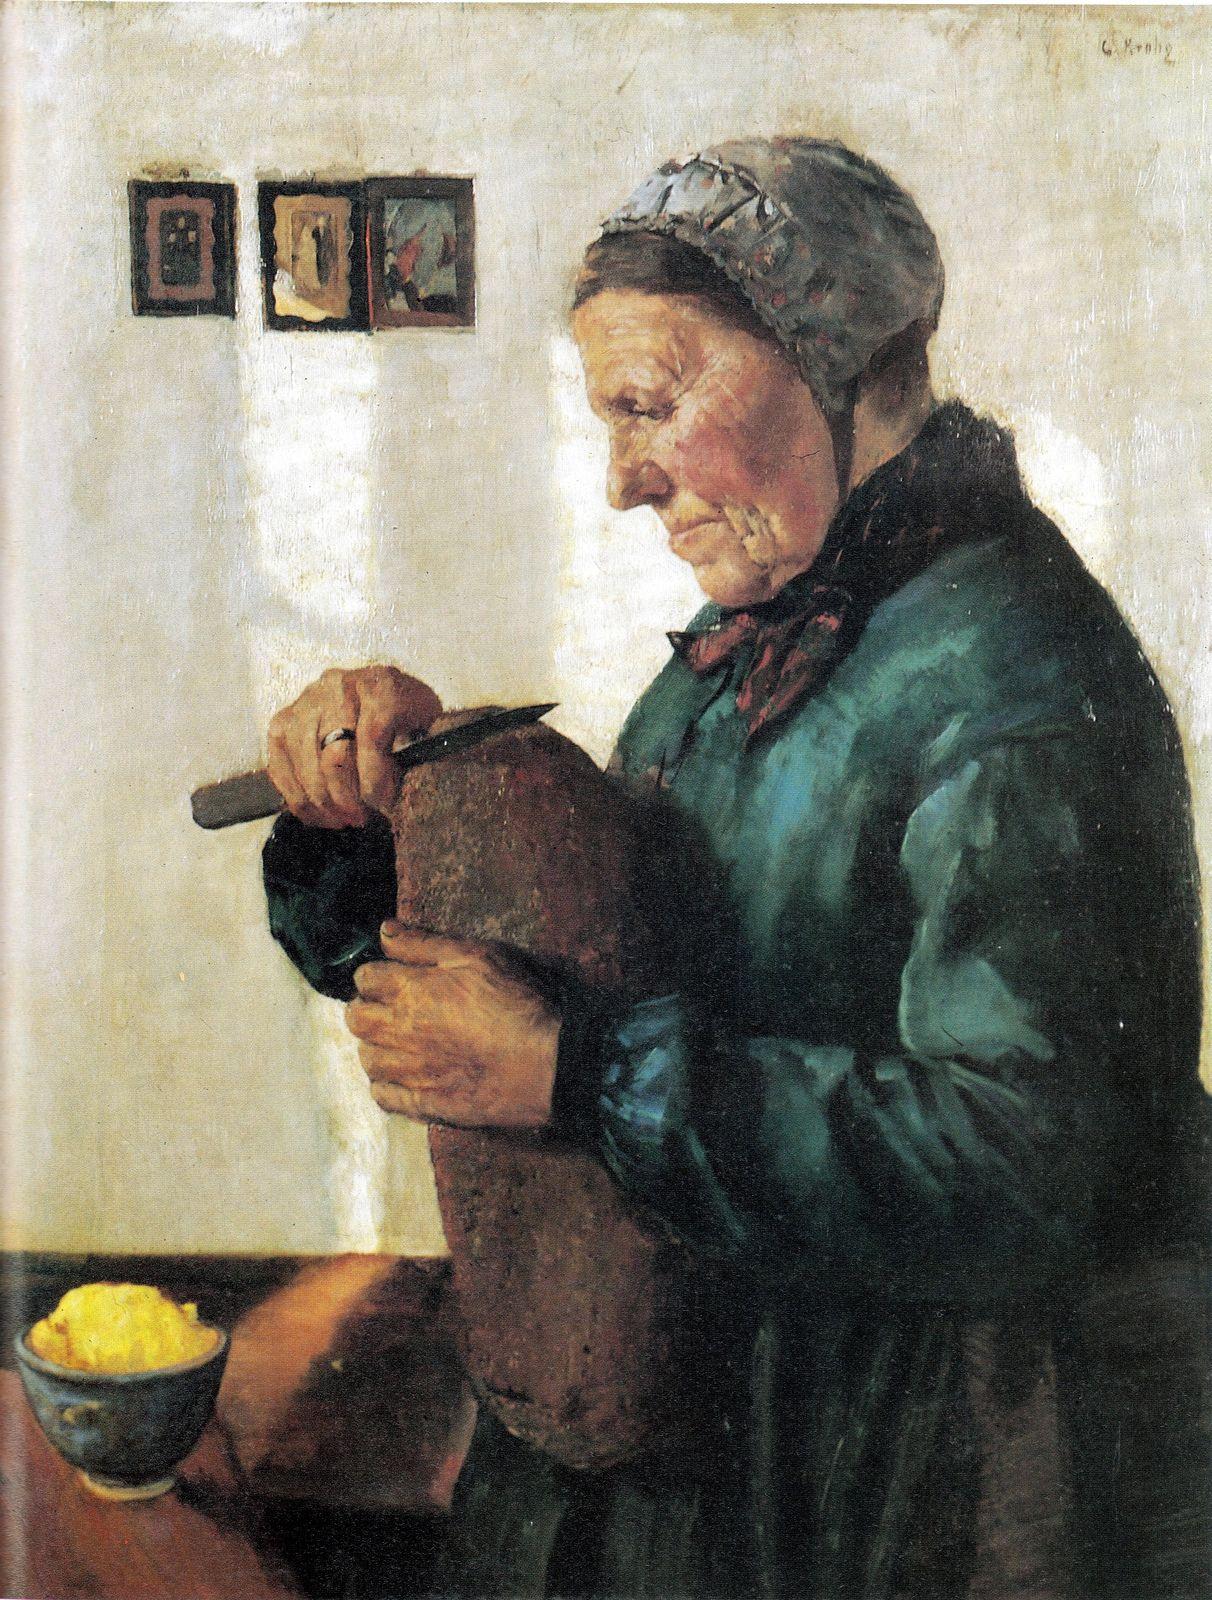 Krohg, Christian (1852-1925) - 1879 Wife Cutting Bread (Bergen Art Museum, Norway)